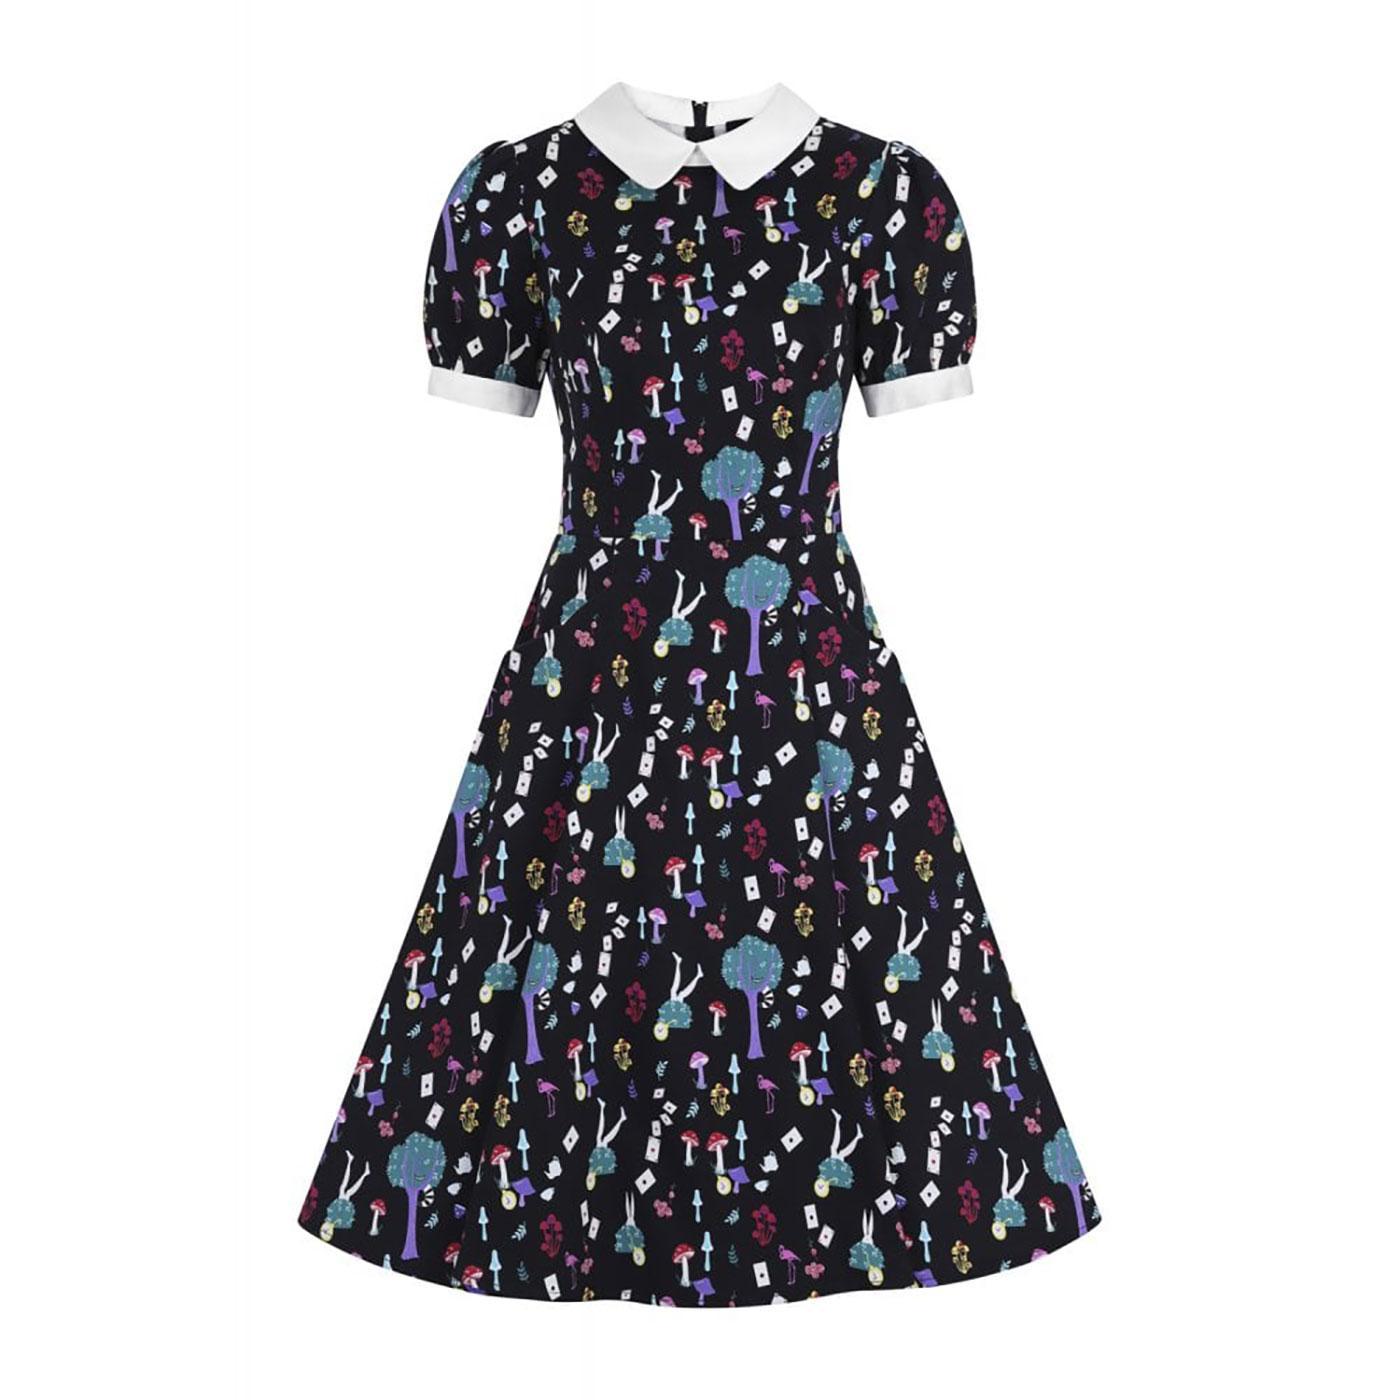 Peta in Wonderland COLLECTIF Printed Swing Dress